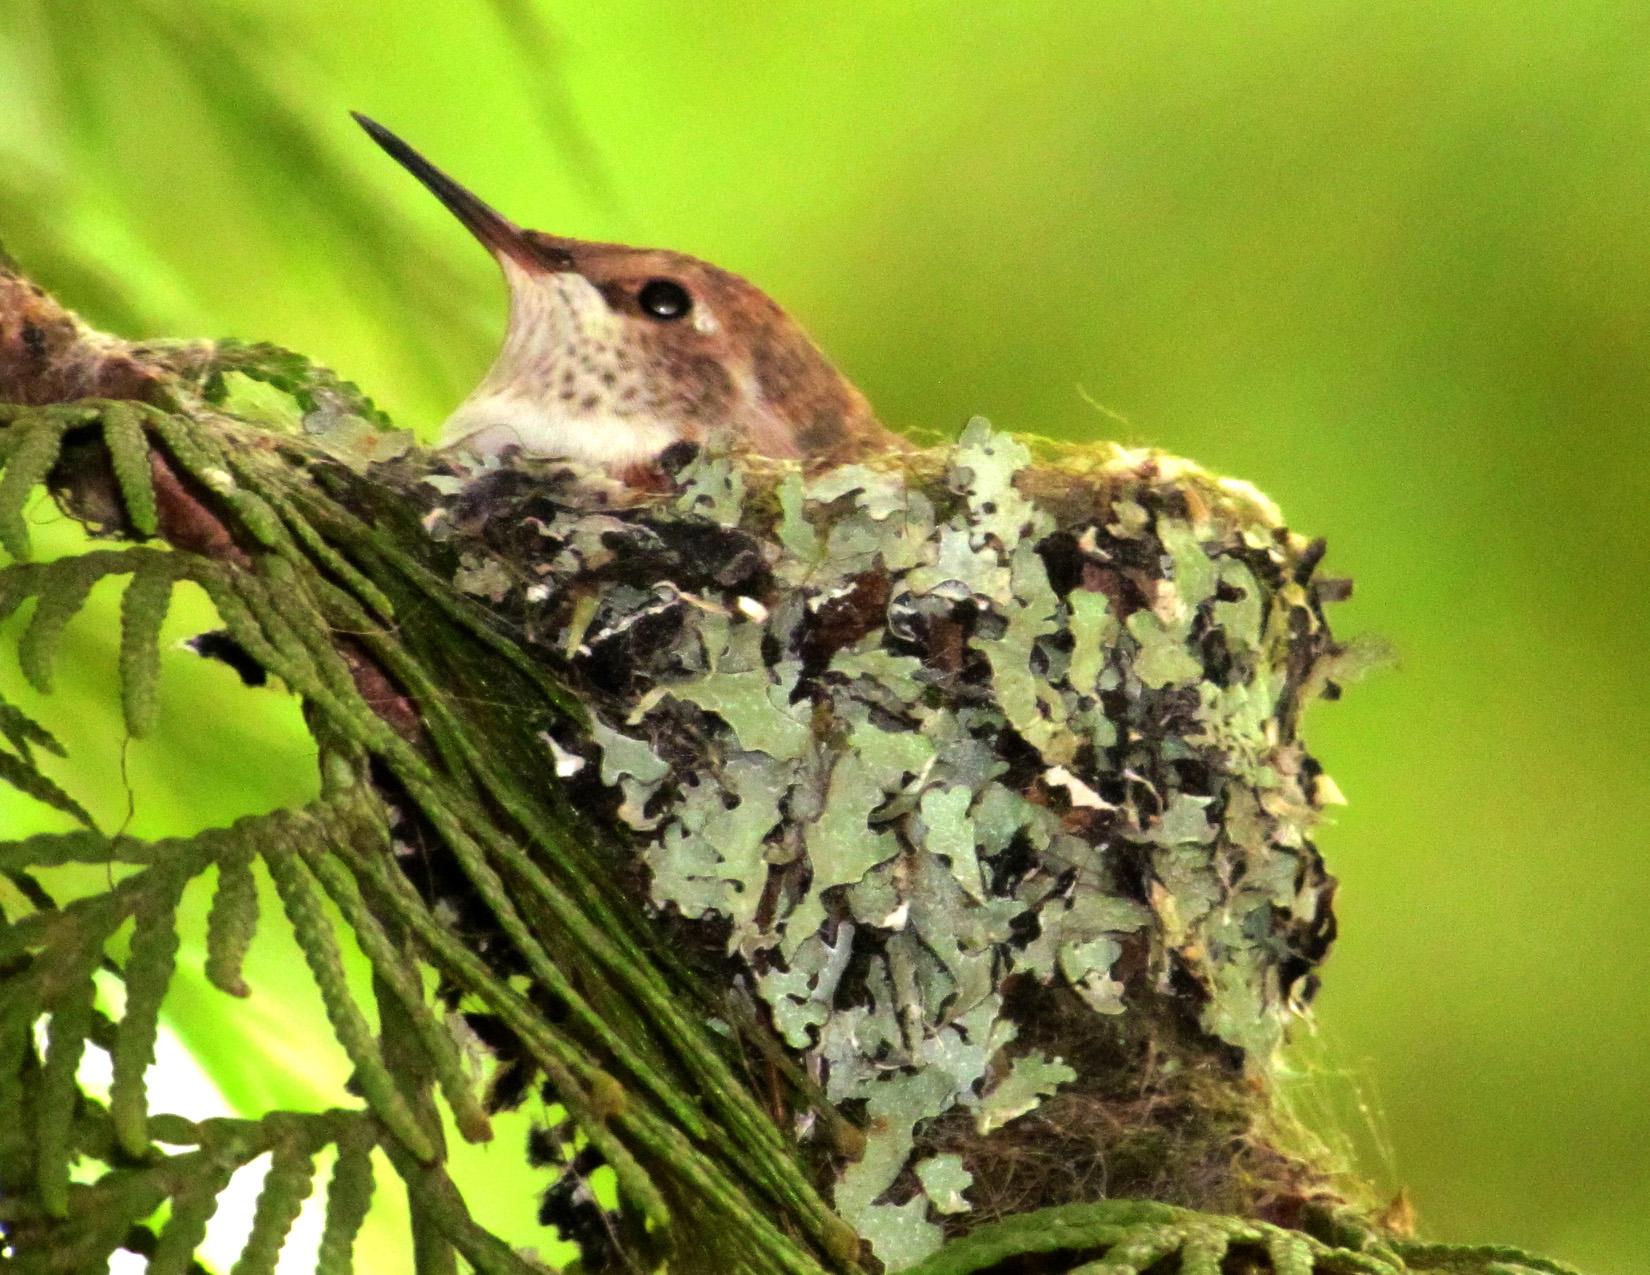 Hummingbird Chick in Nest